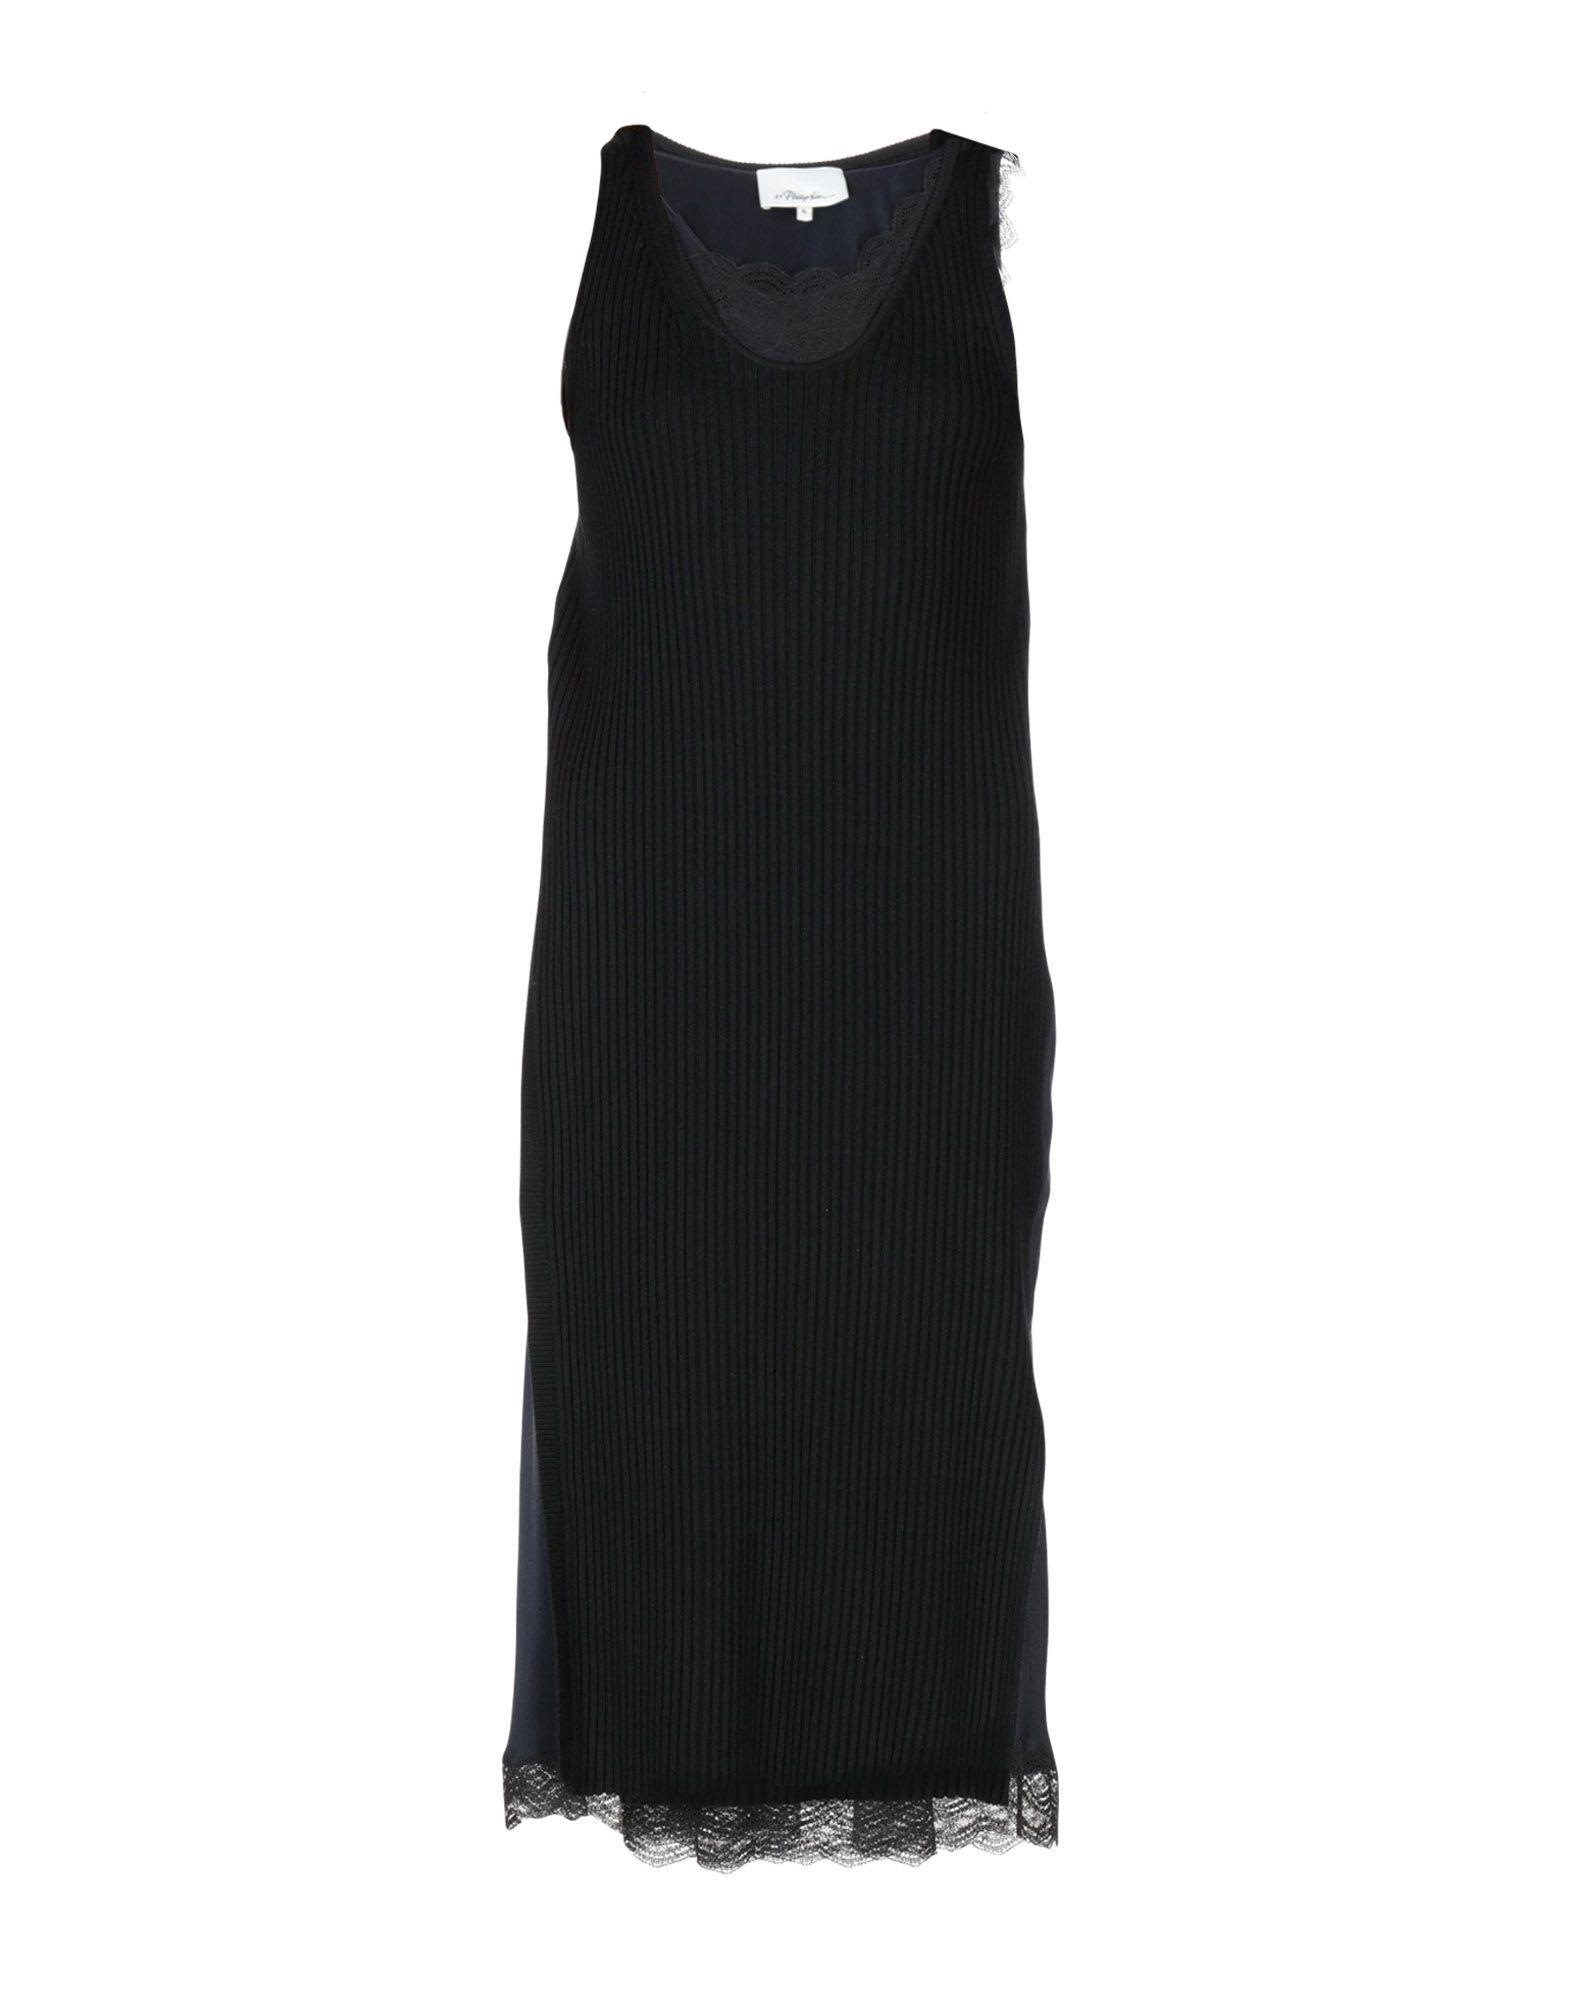 3.1 PHILLIP LIM Платье длиной 3/4 цены онлайн